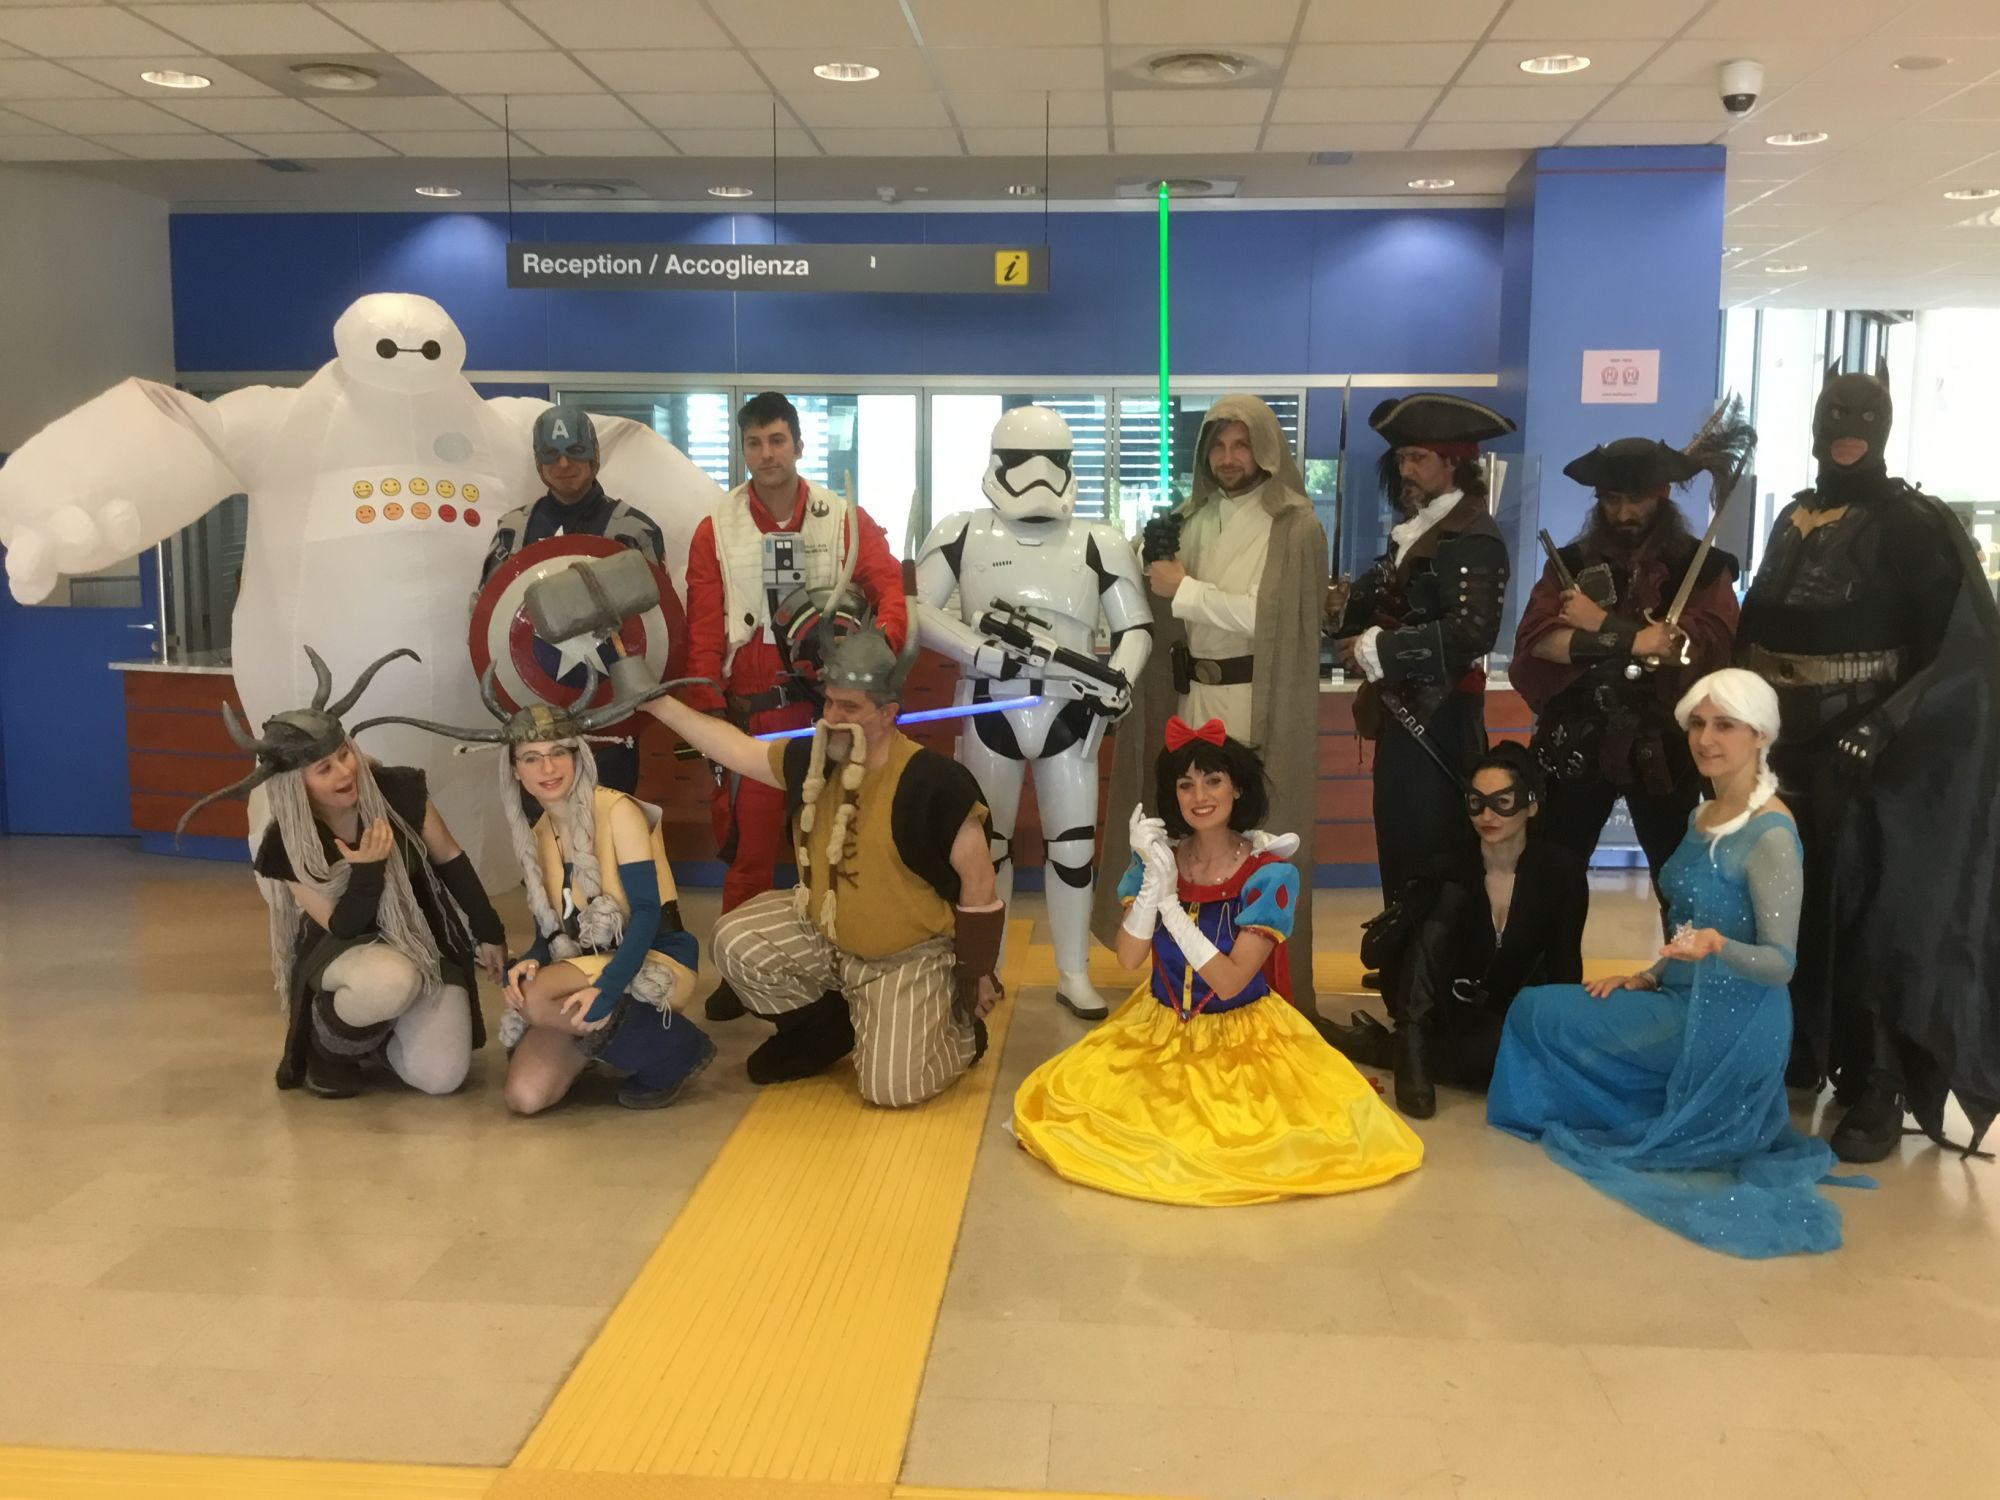 Tornano i supereroi in Pediatria all'ospedale di Lucca